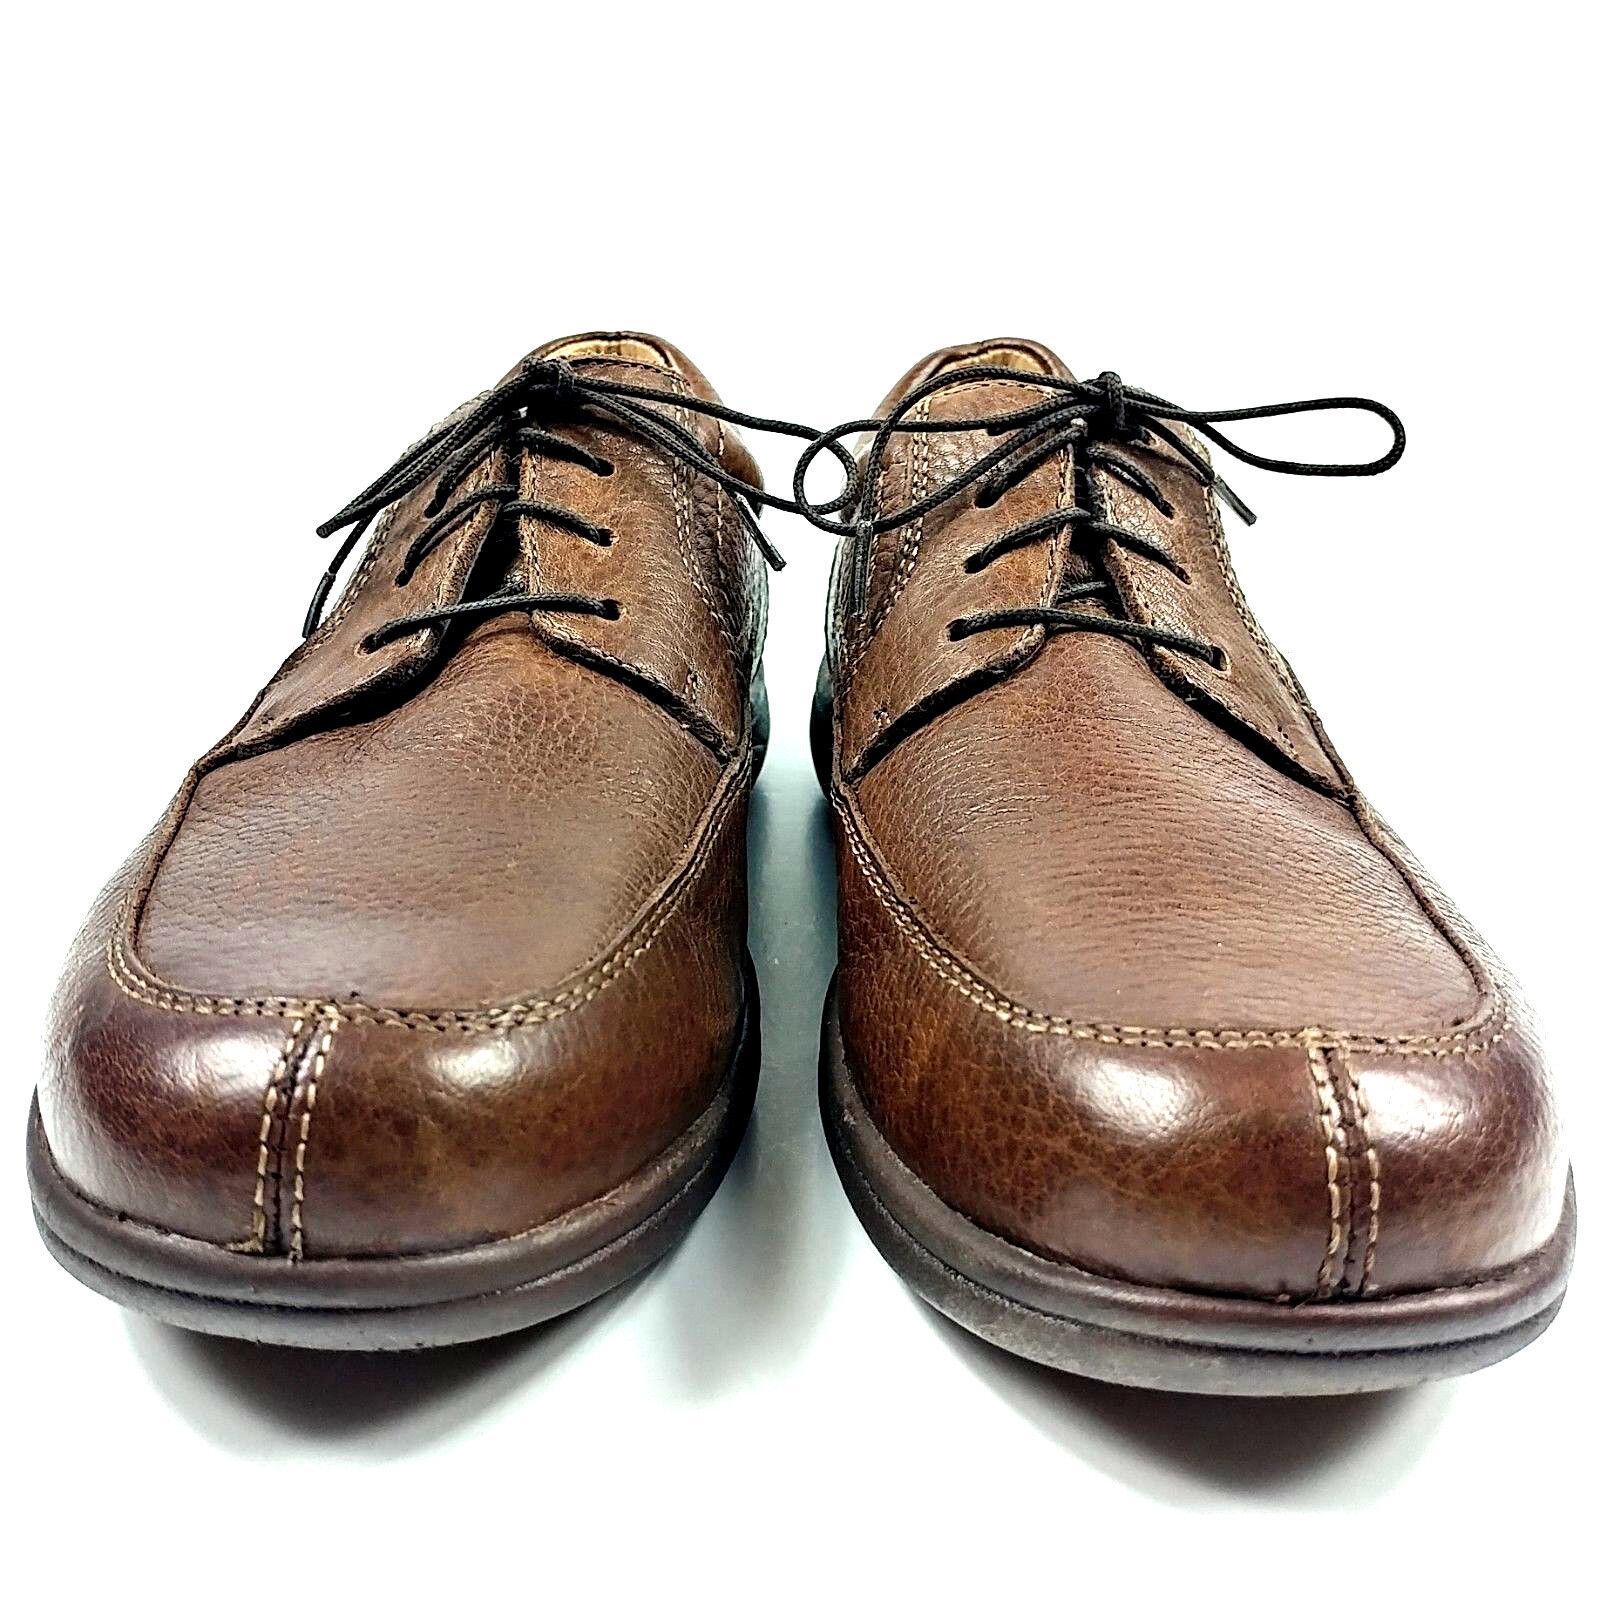 ABEO SMART SMART SMART SYSTEMS-3820 TIE damen lace Up Moc Toe braun Leather schuhe Größe 7.5M 979491